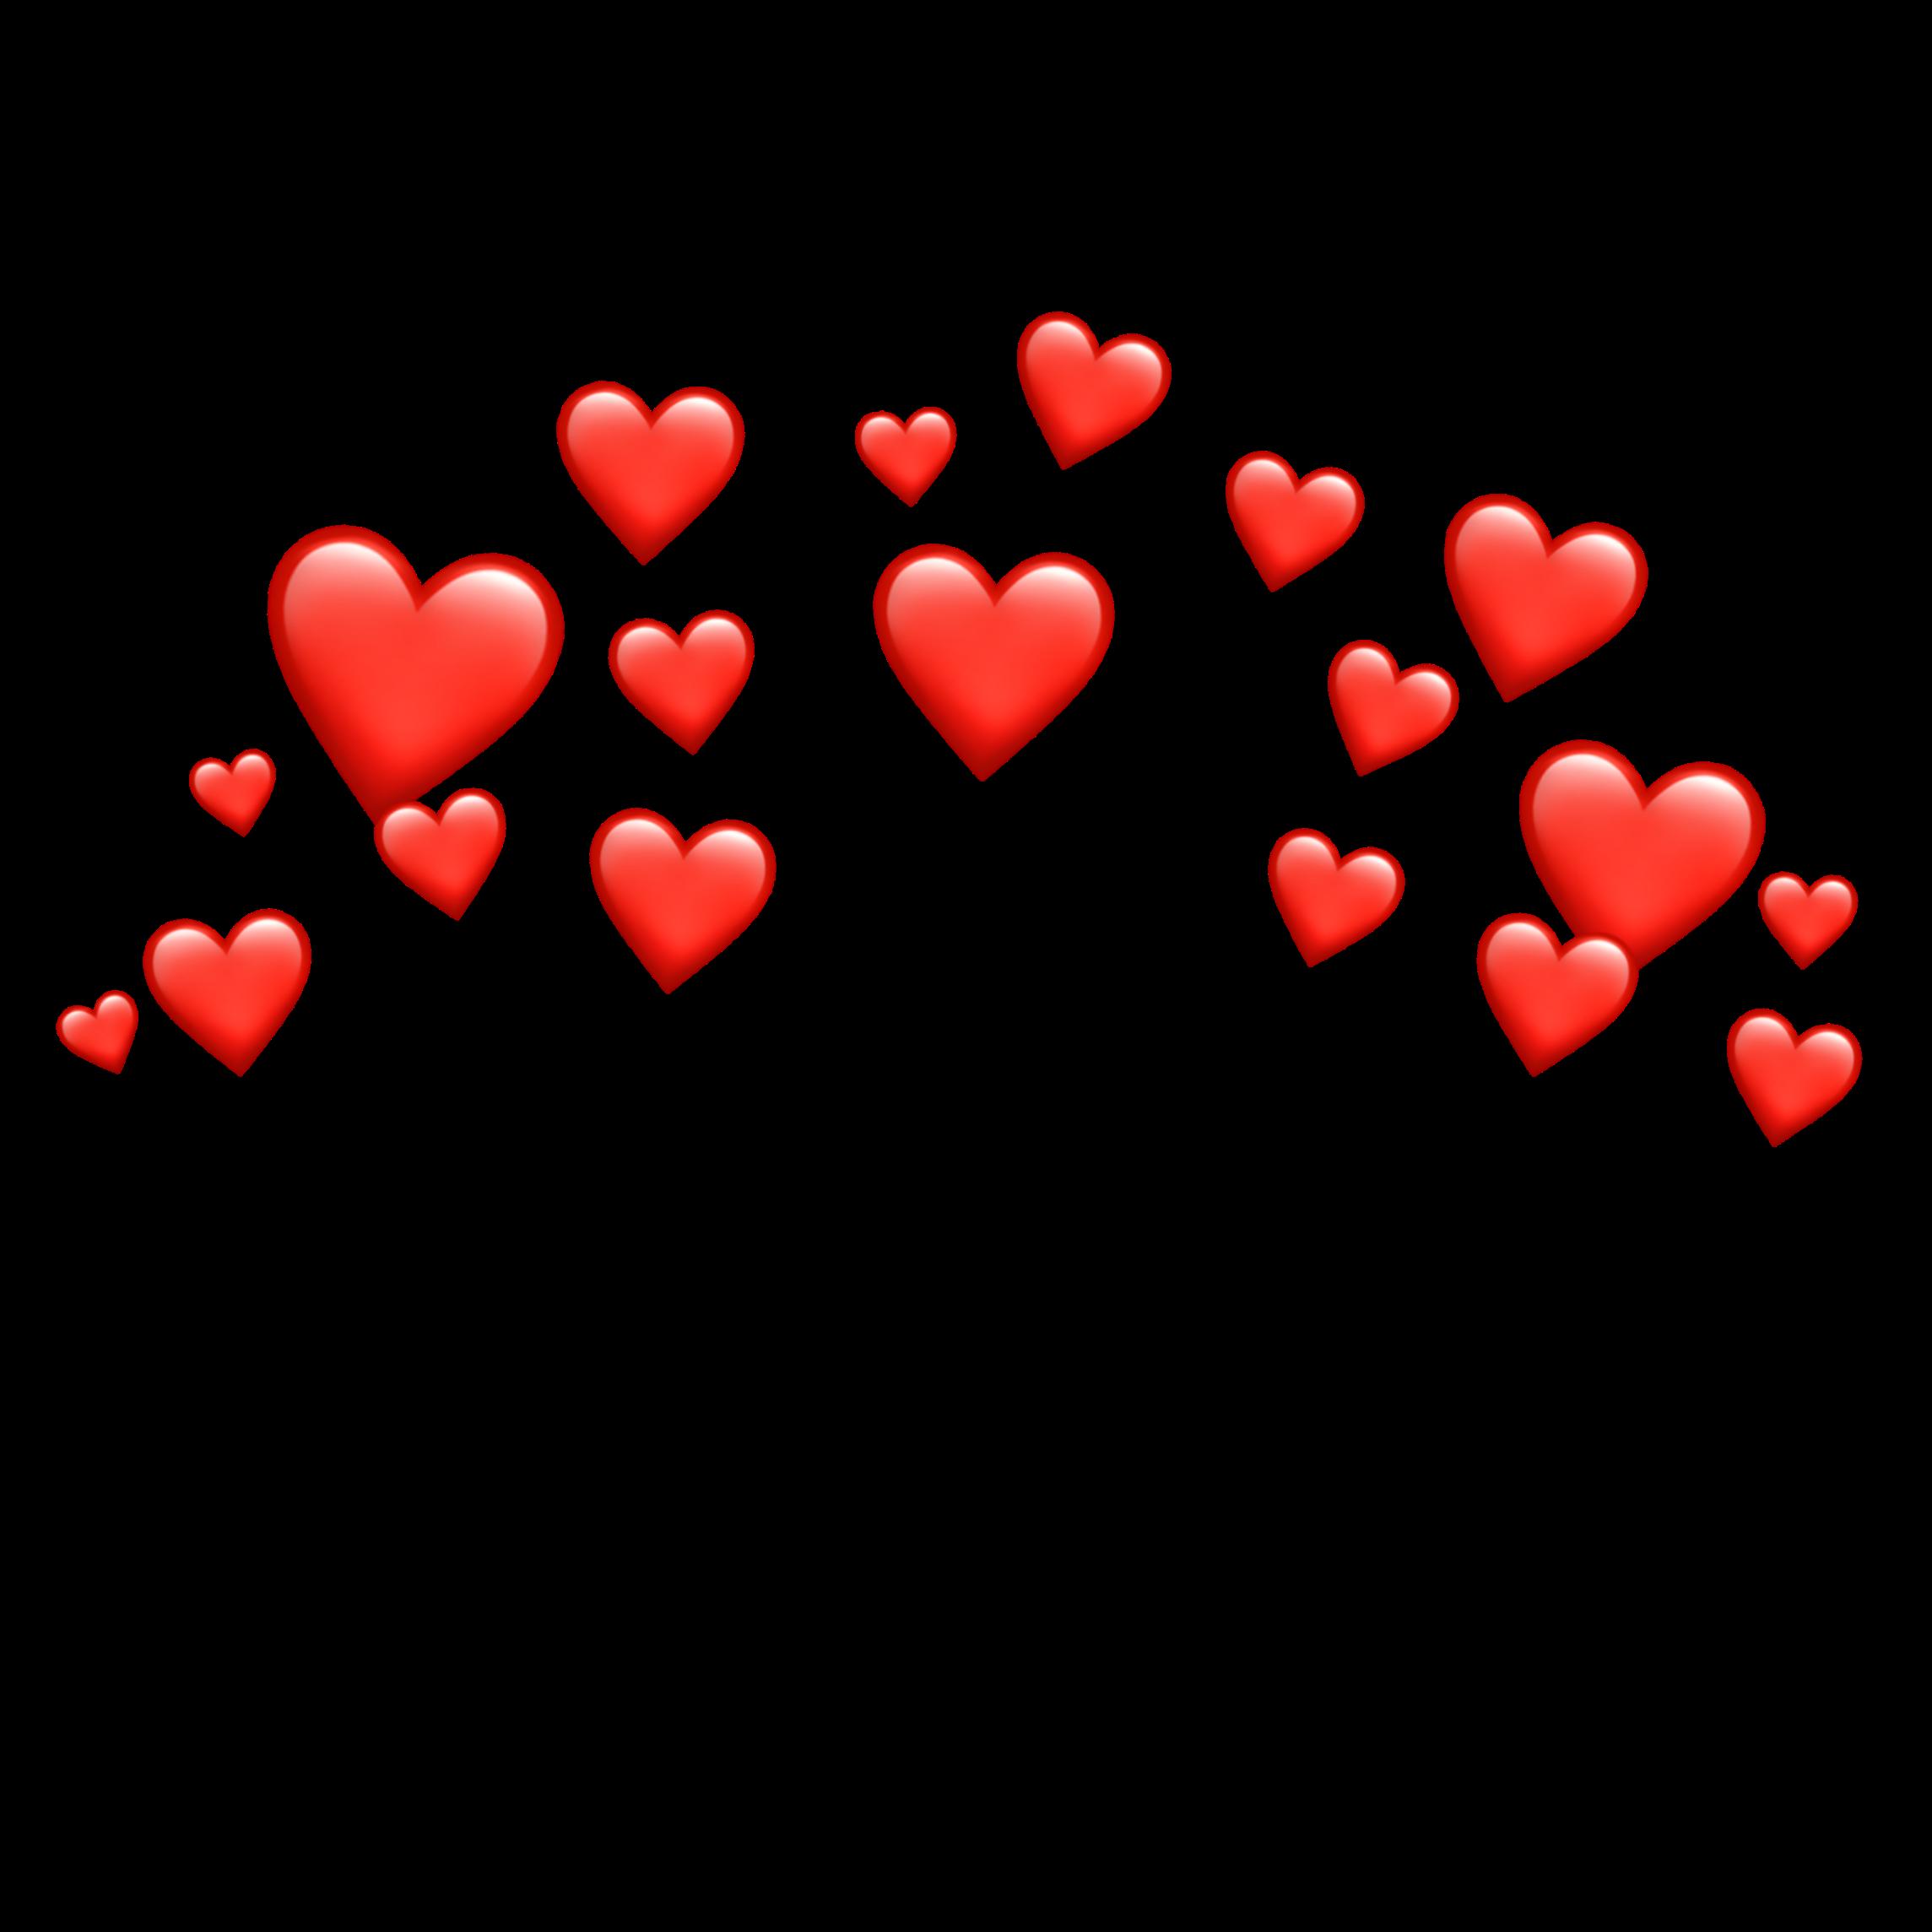 Freetoedit Crown Heart Hearts Emoji Emojis Tumblr Remixit Cute Tumblr Wallpaper Emoji Flower Cute Emoji Wallpaper